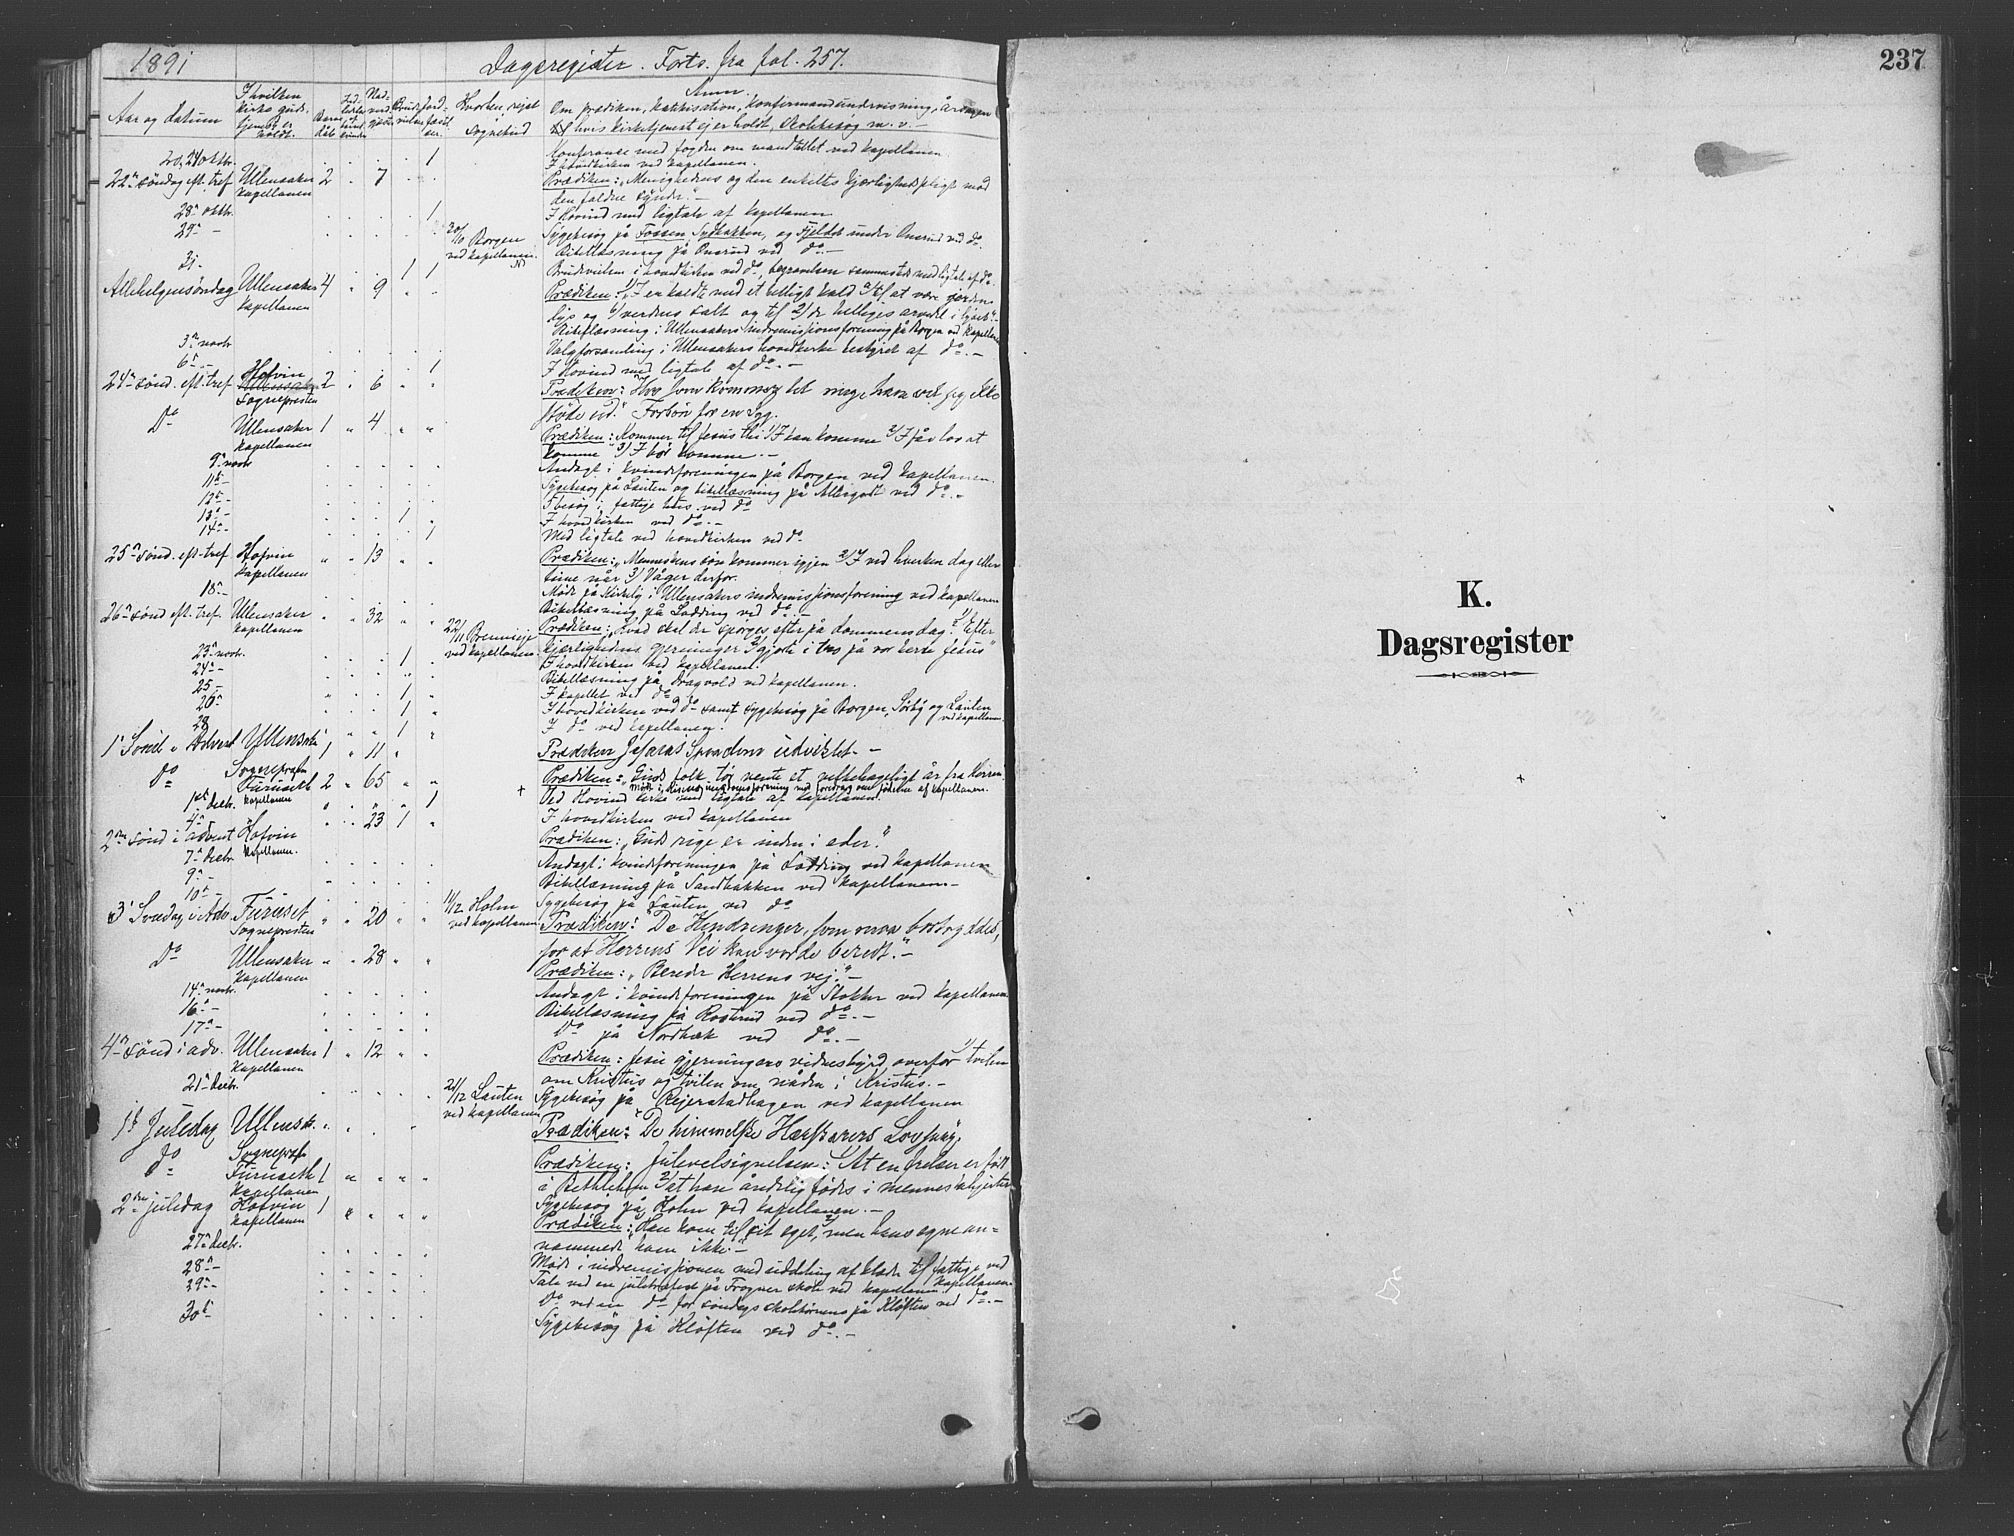 SAO, Ullensaker prestekontor Kirkebøker, F/Fb/L0001: Ministerialbok nr. II 1, 1878-1893, s. 237